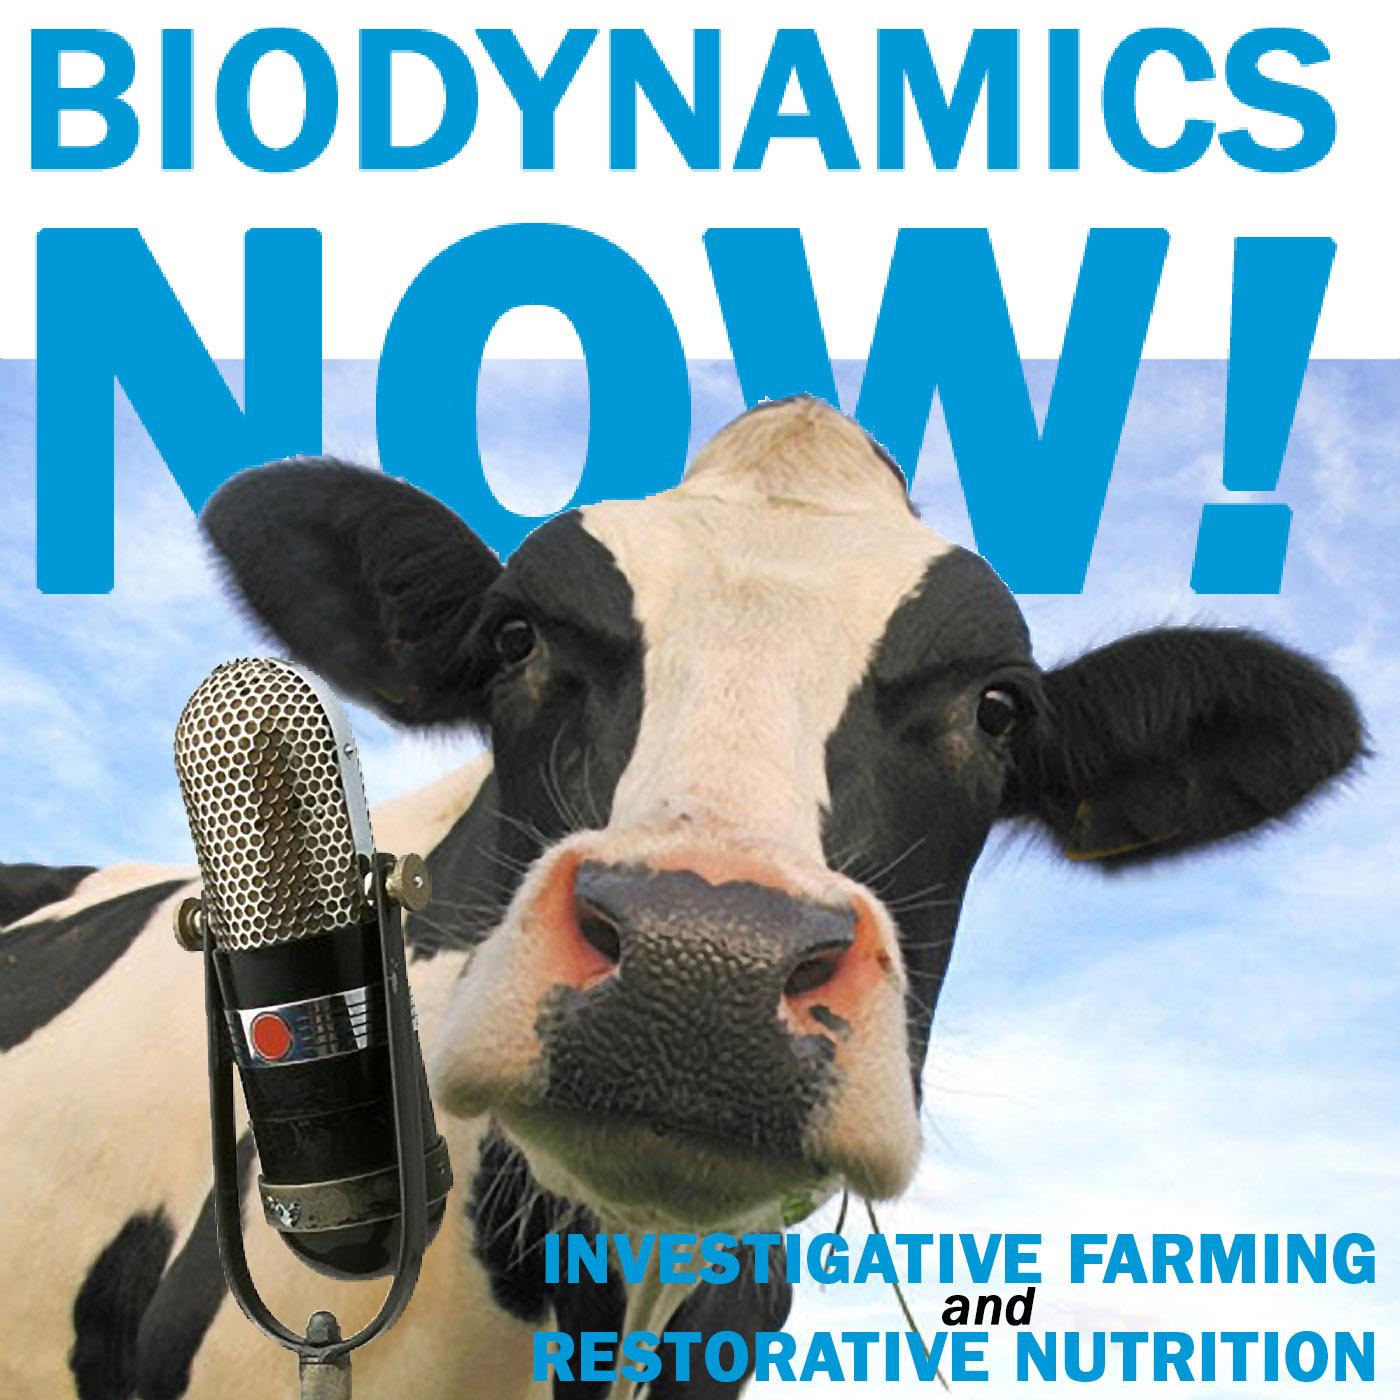 BD Now! Podcast Episode 024 Deirdre Keekin, Vinter, Biodynamic Viticulturist, Author of